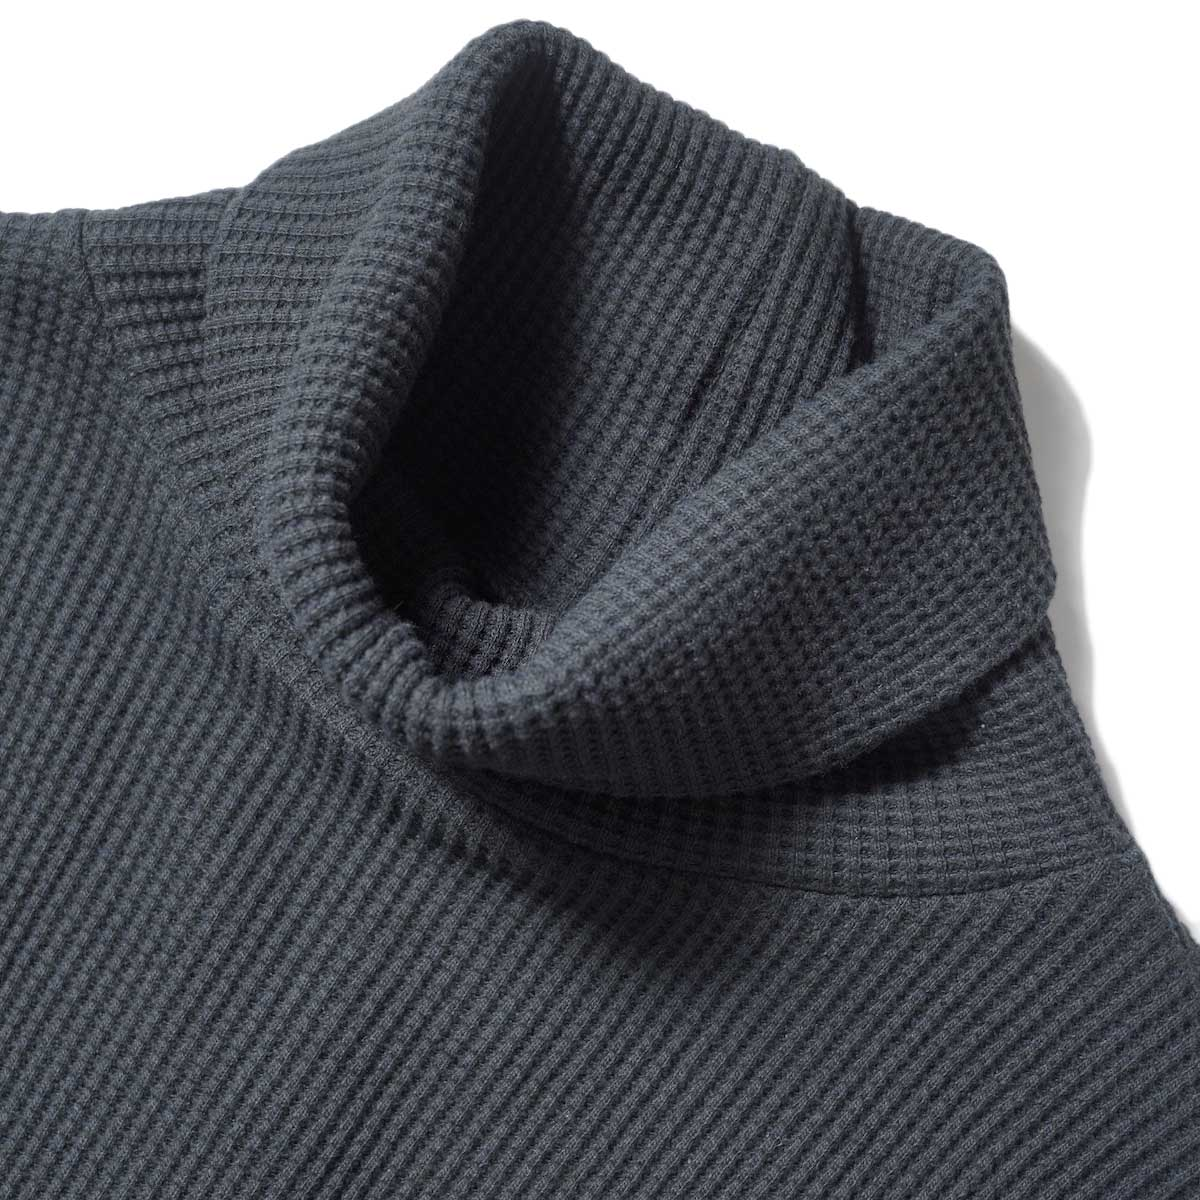 SOIL / TURTLE NECK L/SL (Black) ネック